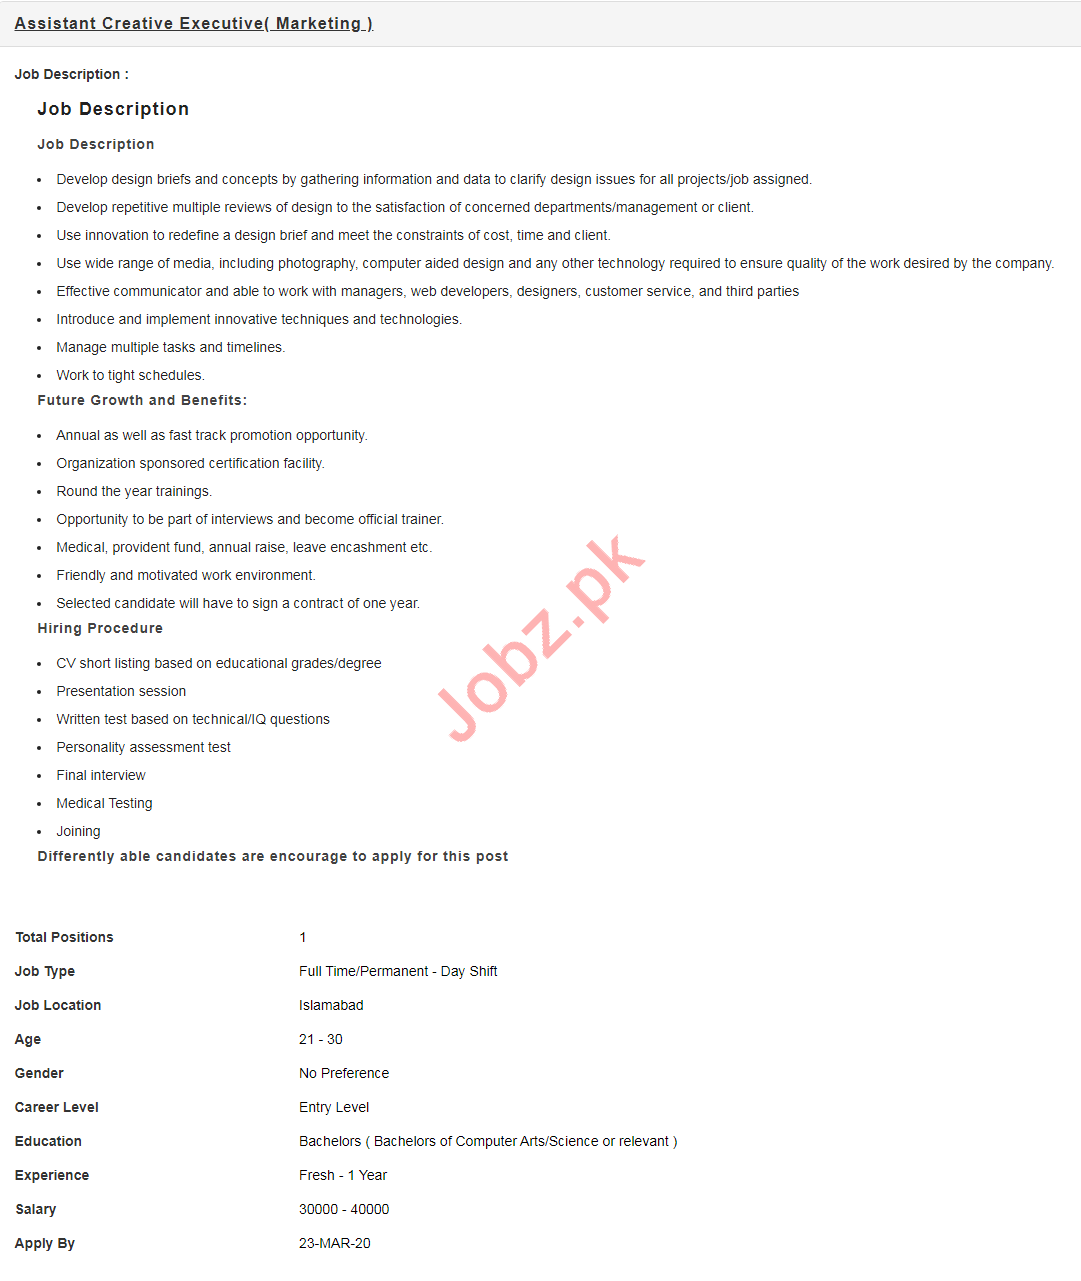 Assistant Creative Executive Jobs 2020 in Nayatel